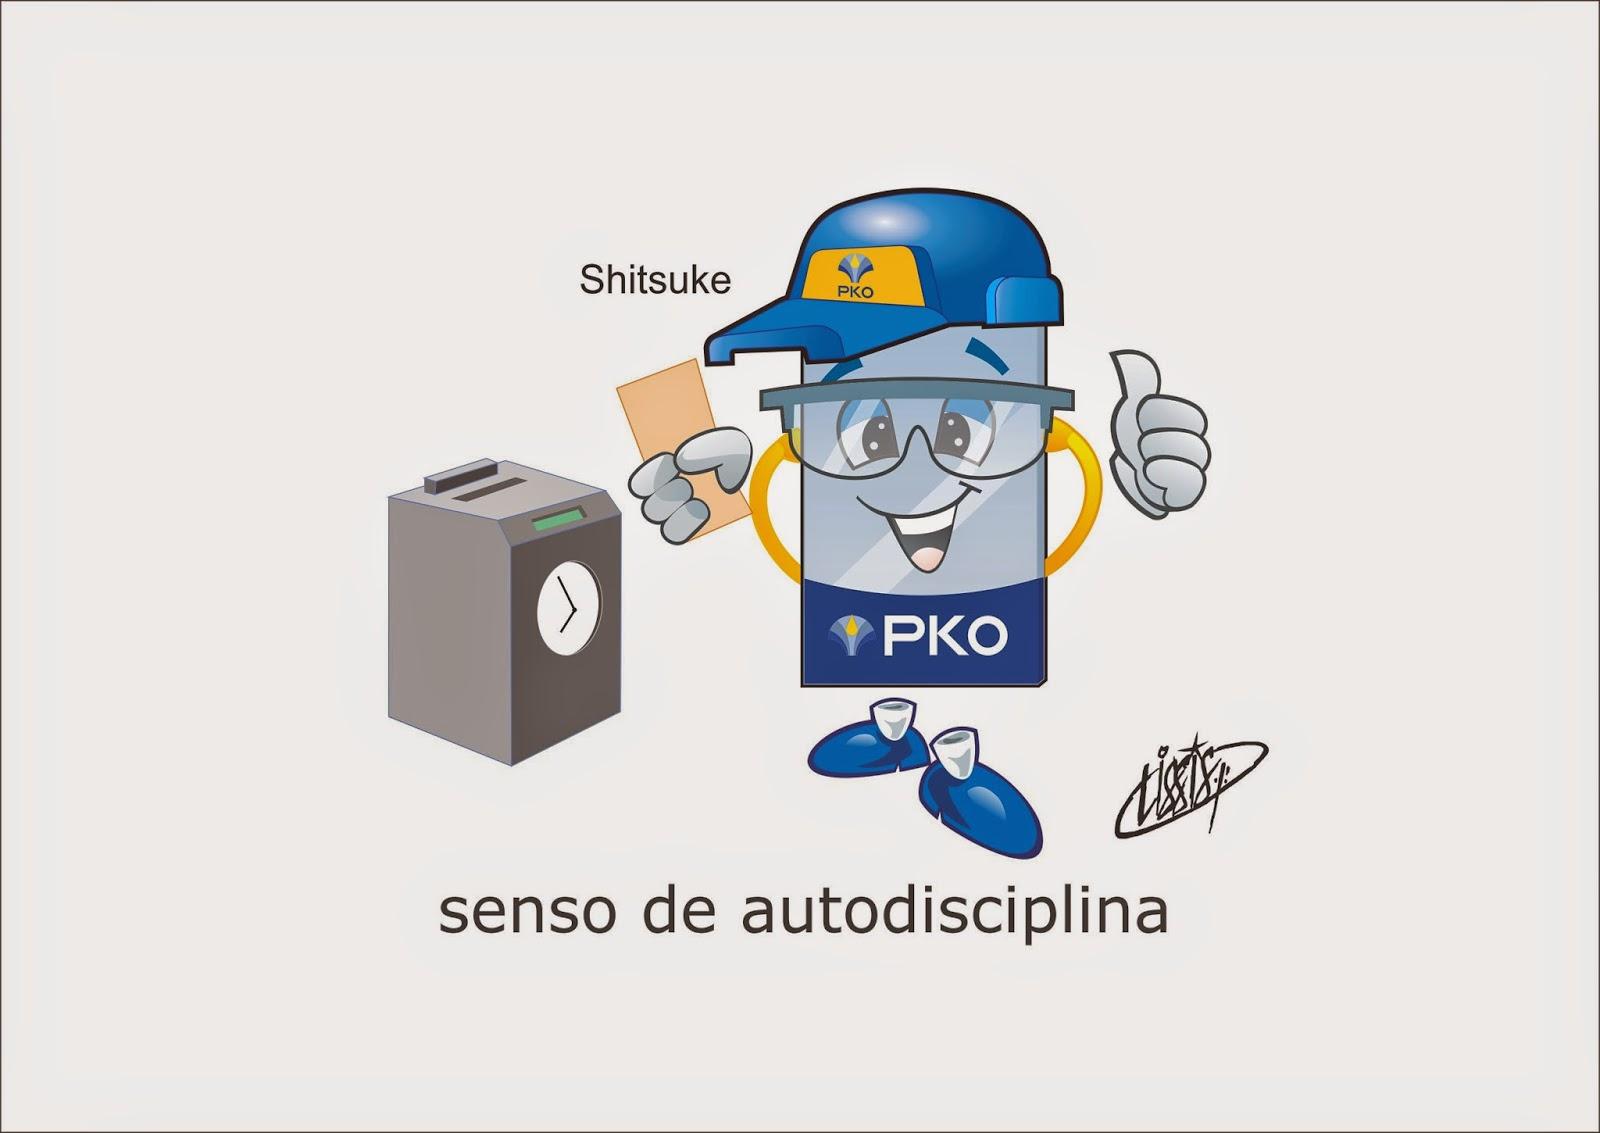 Programa 5 S desenho senso autodisciplina 01 Shitsuke